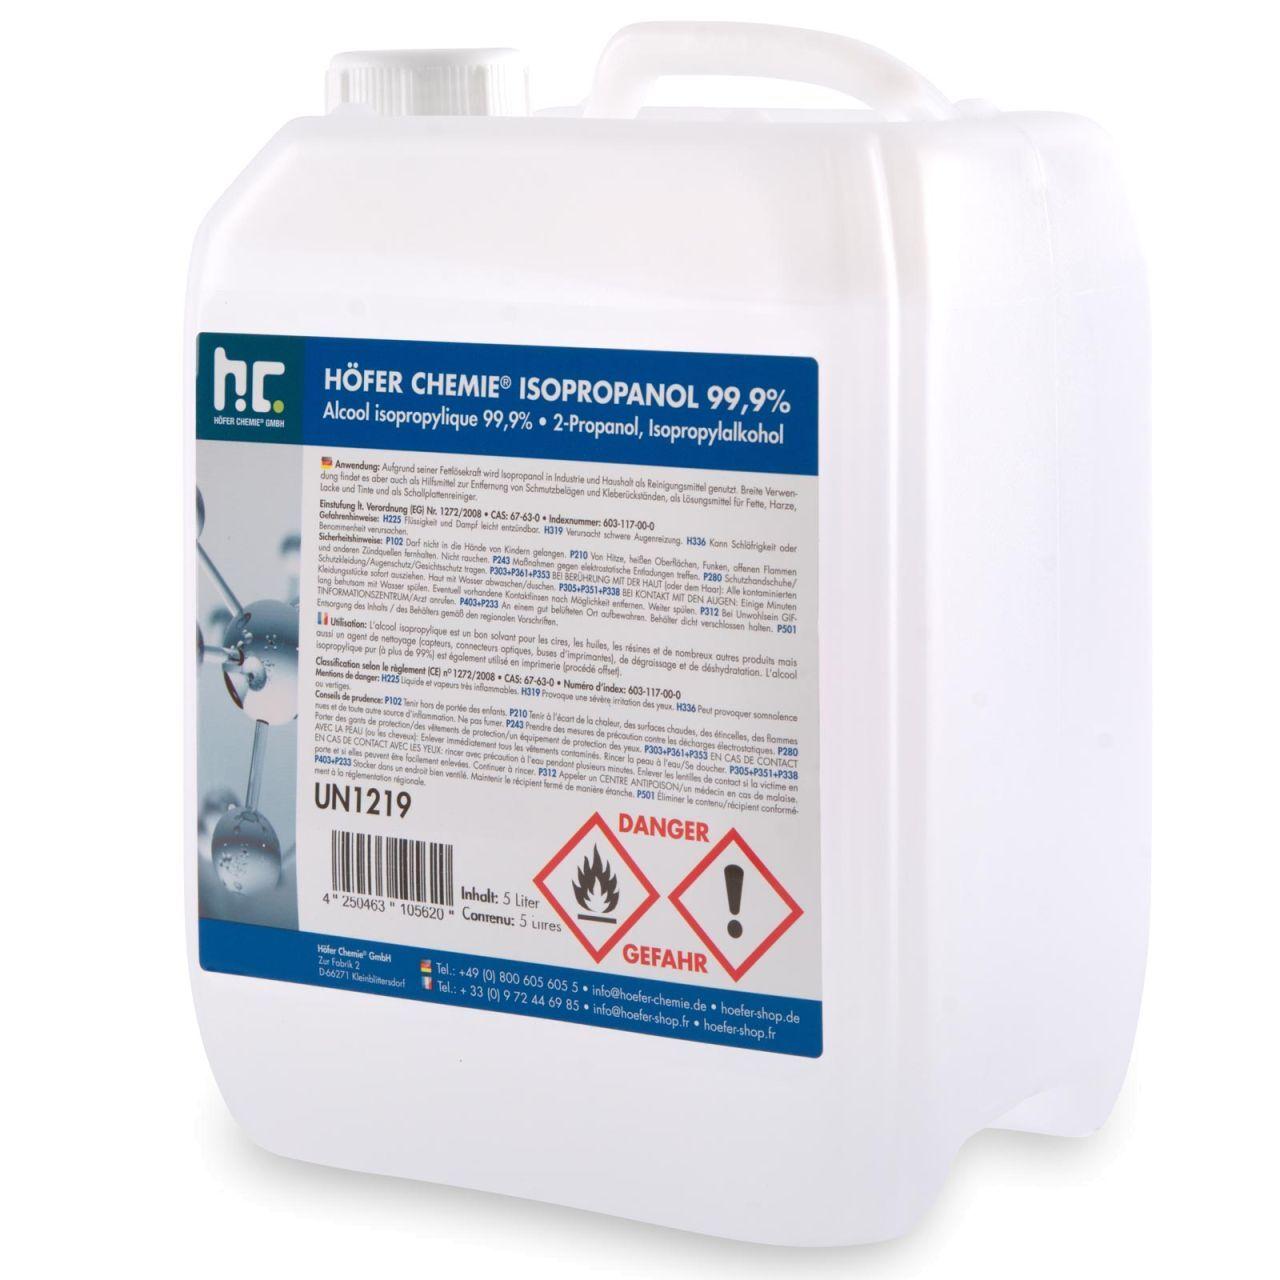 Höfer Chemie 20 l Alcool isopropylique 99,9 % (4 x 5 l)